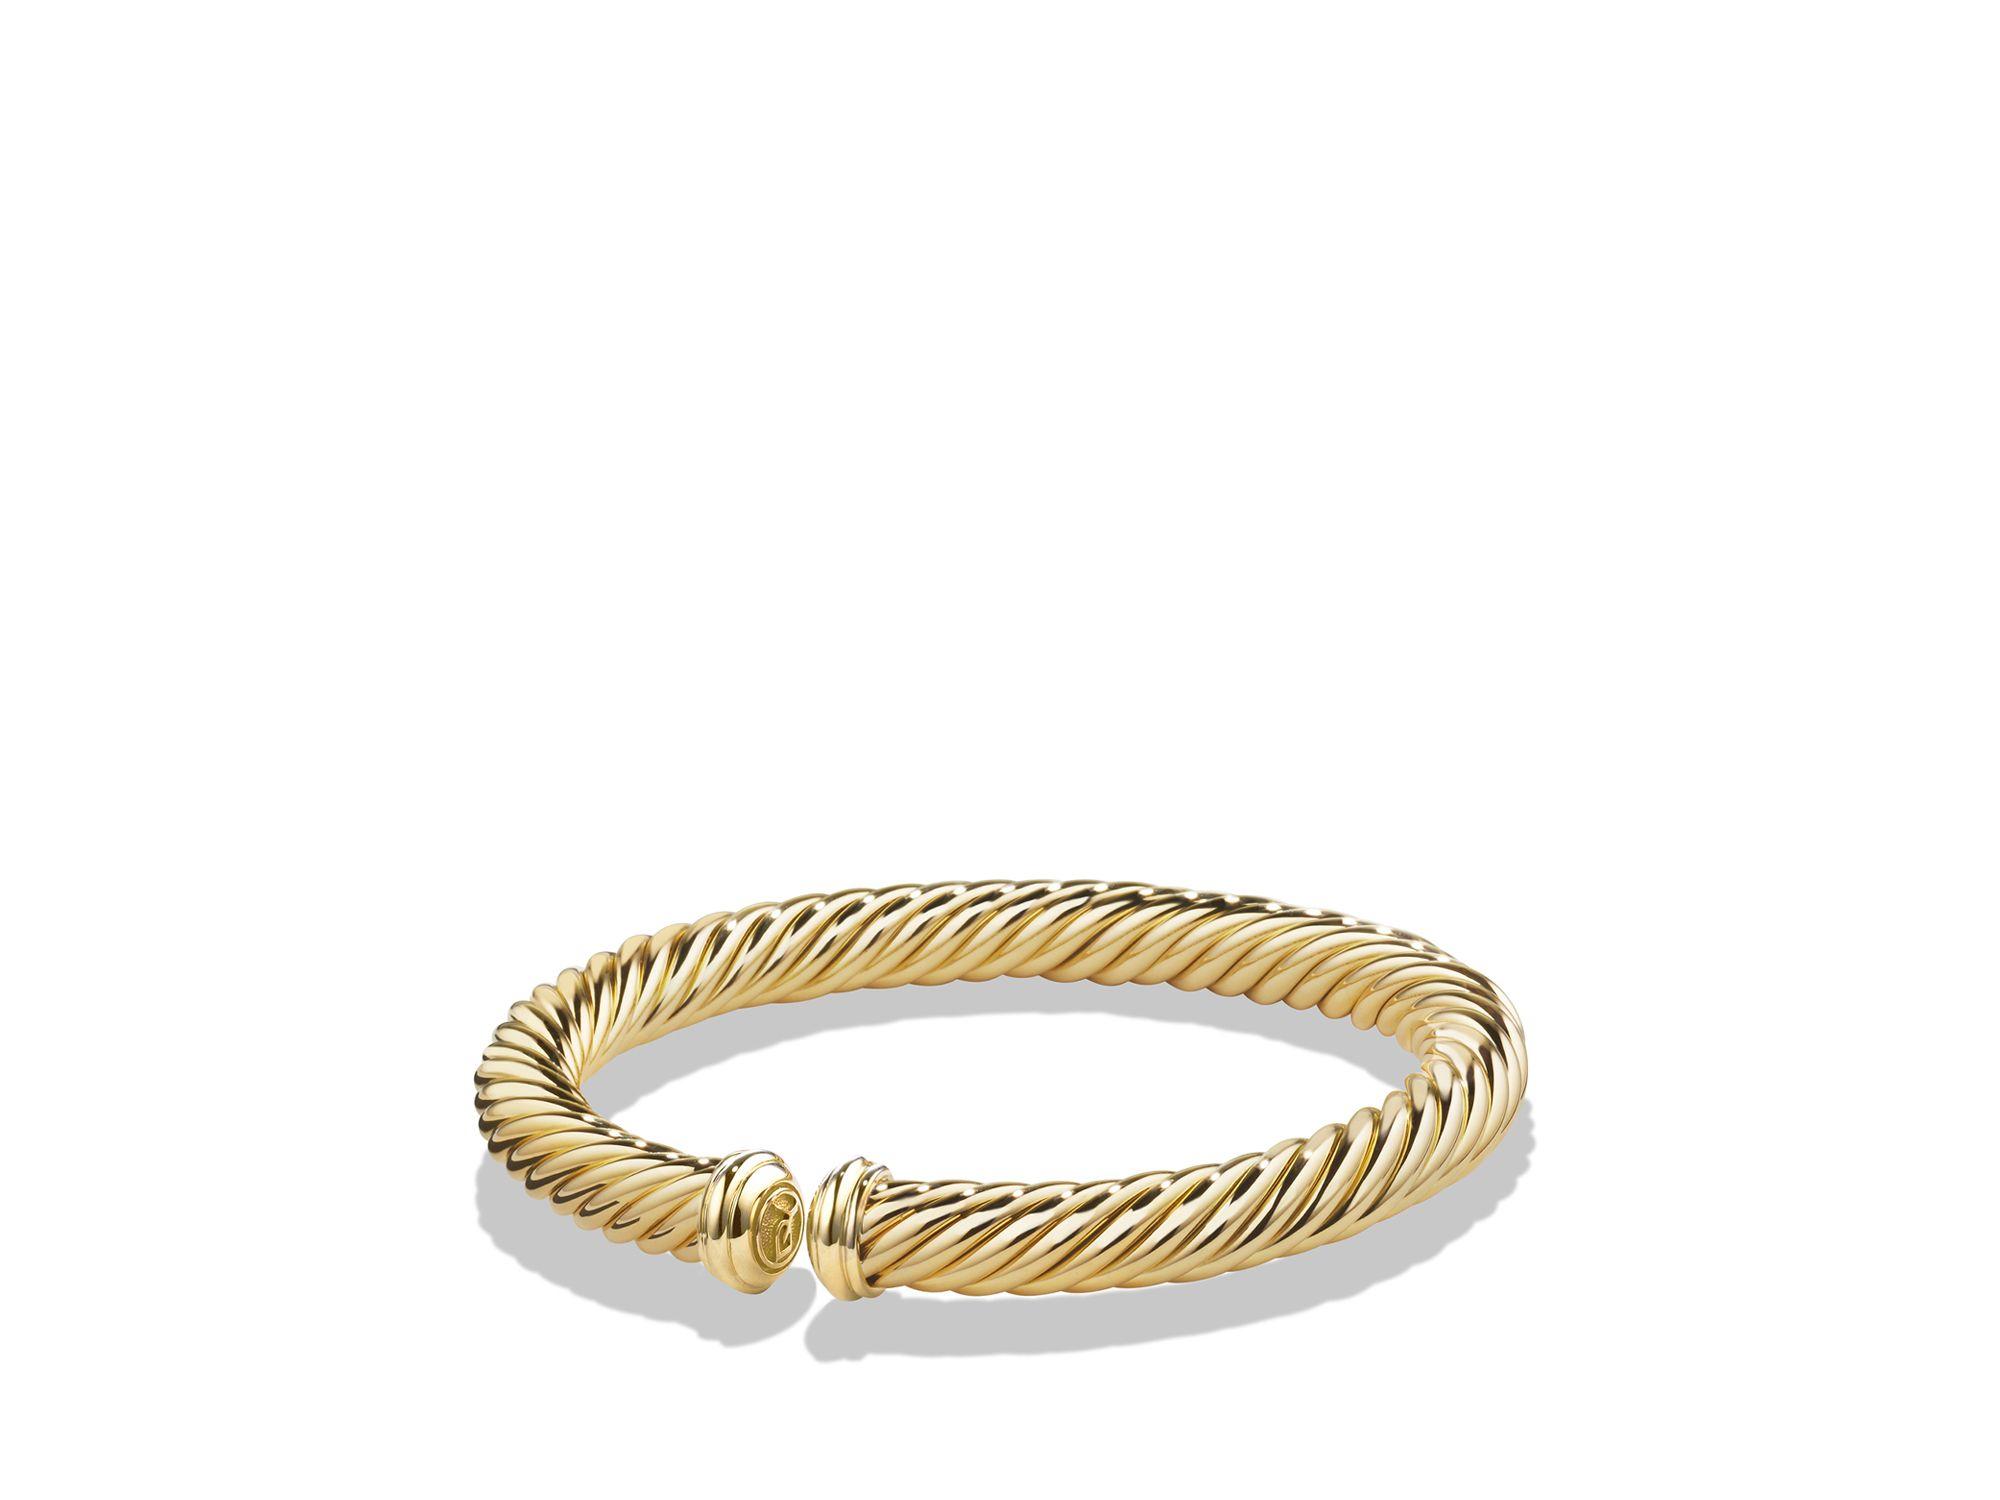 David Yurman Cable Spira Bracelet In 18k Gold In Metallic